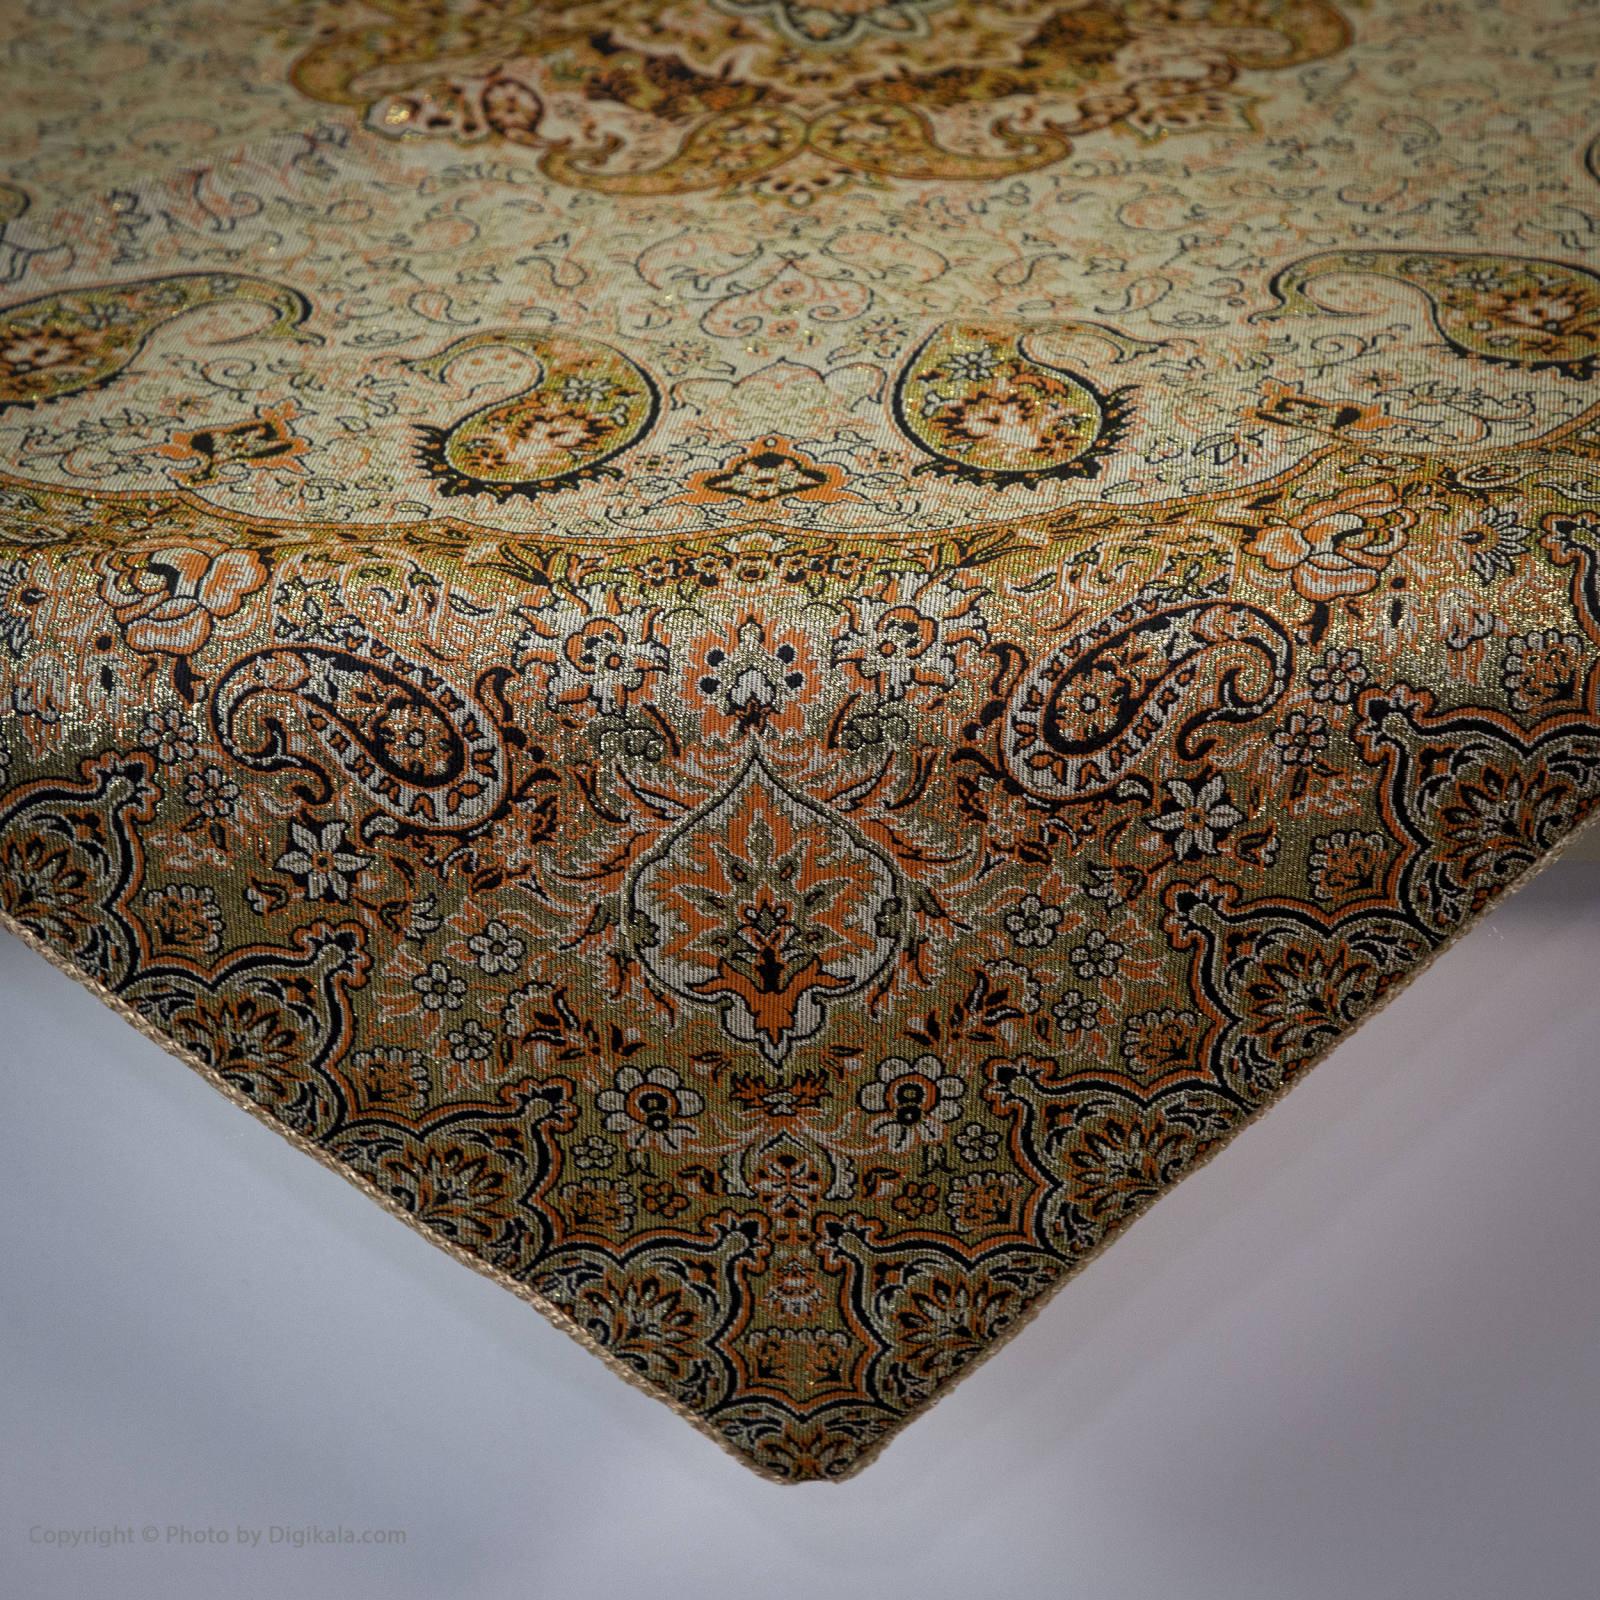 4 PCS Nastaran cashmere tablecloth, code KR4-4